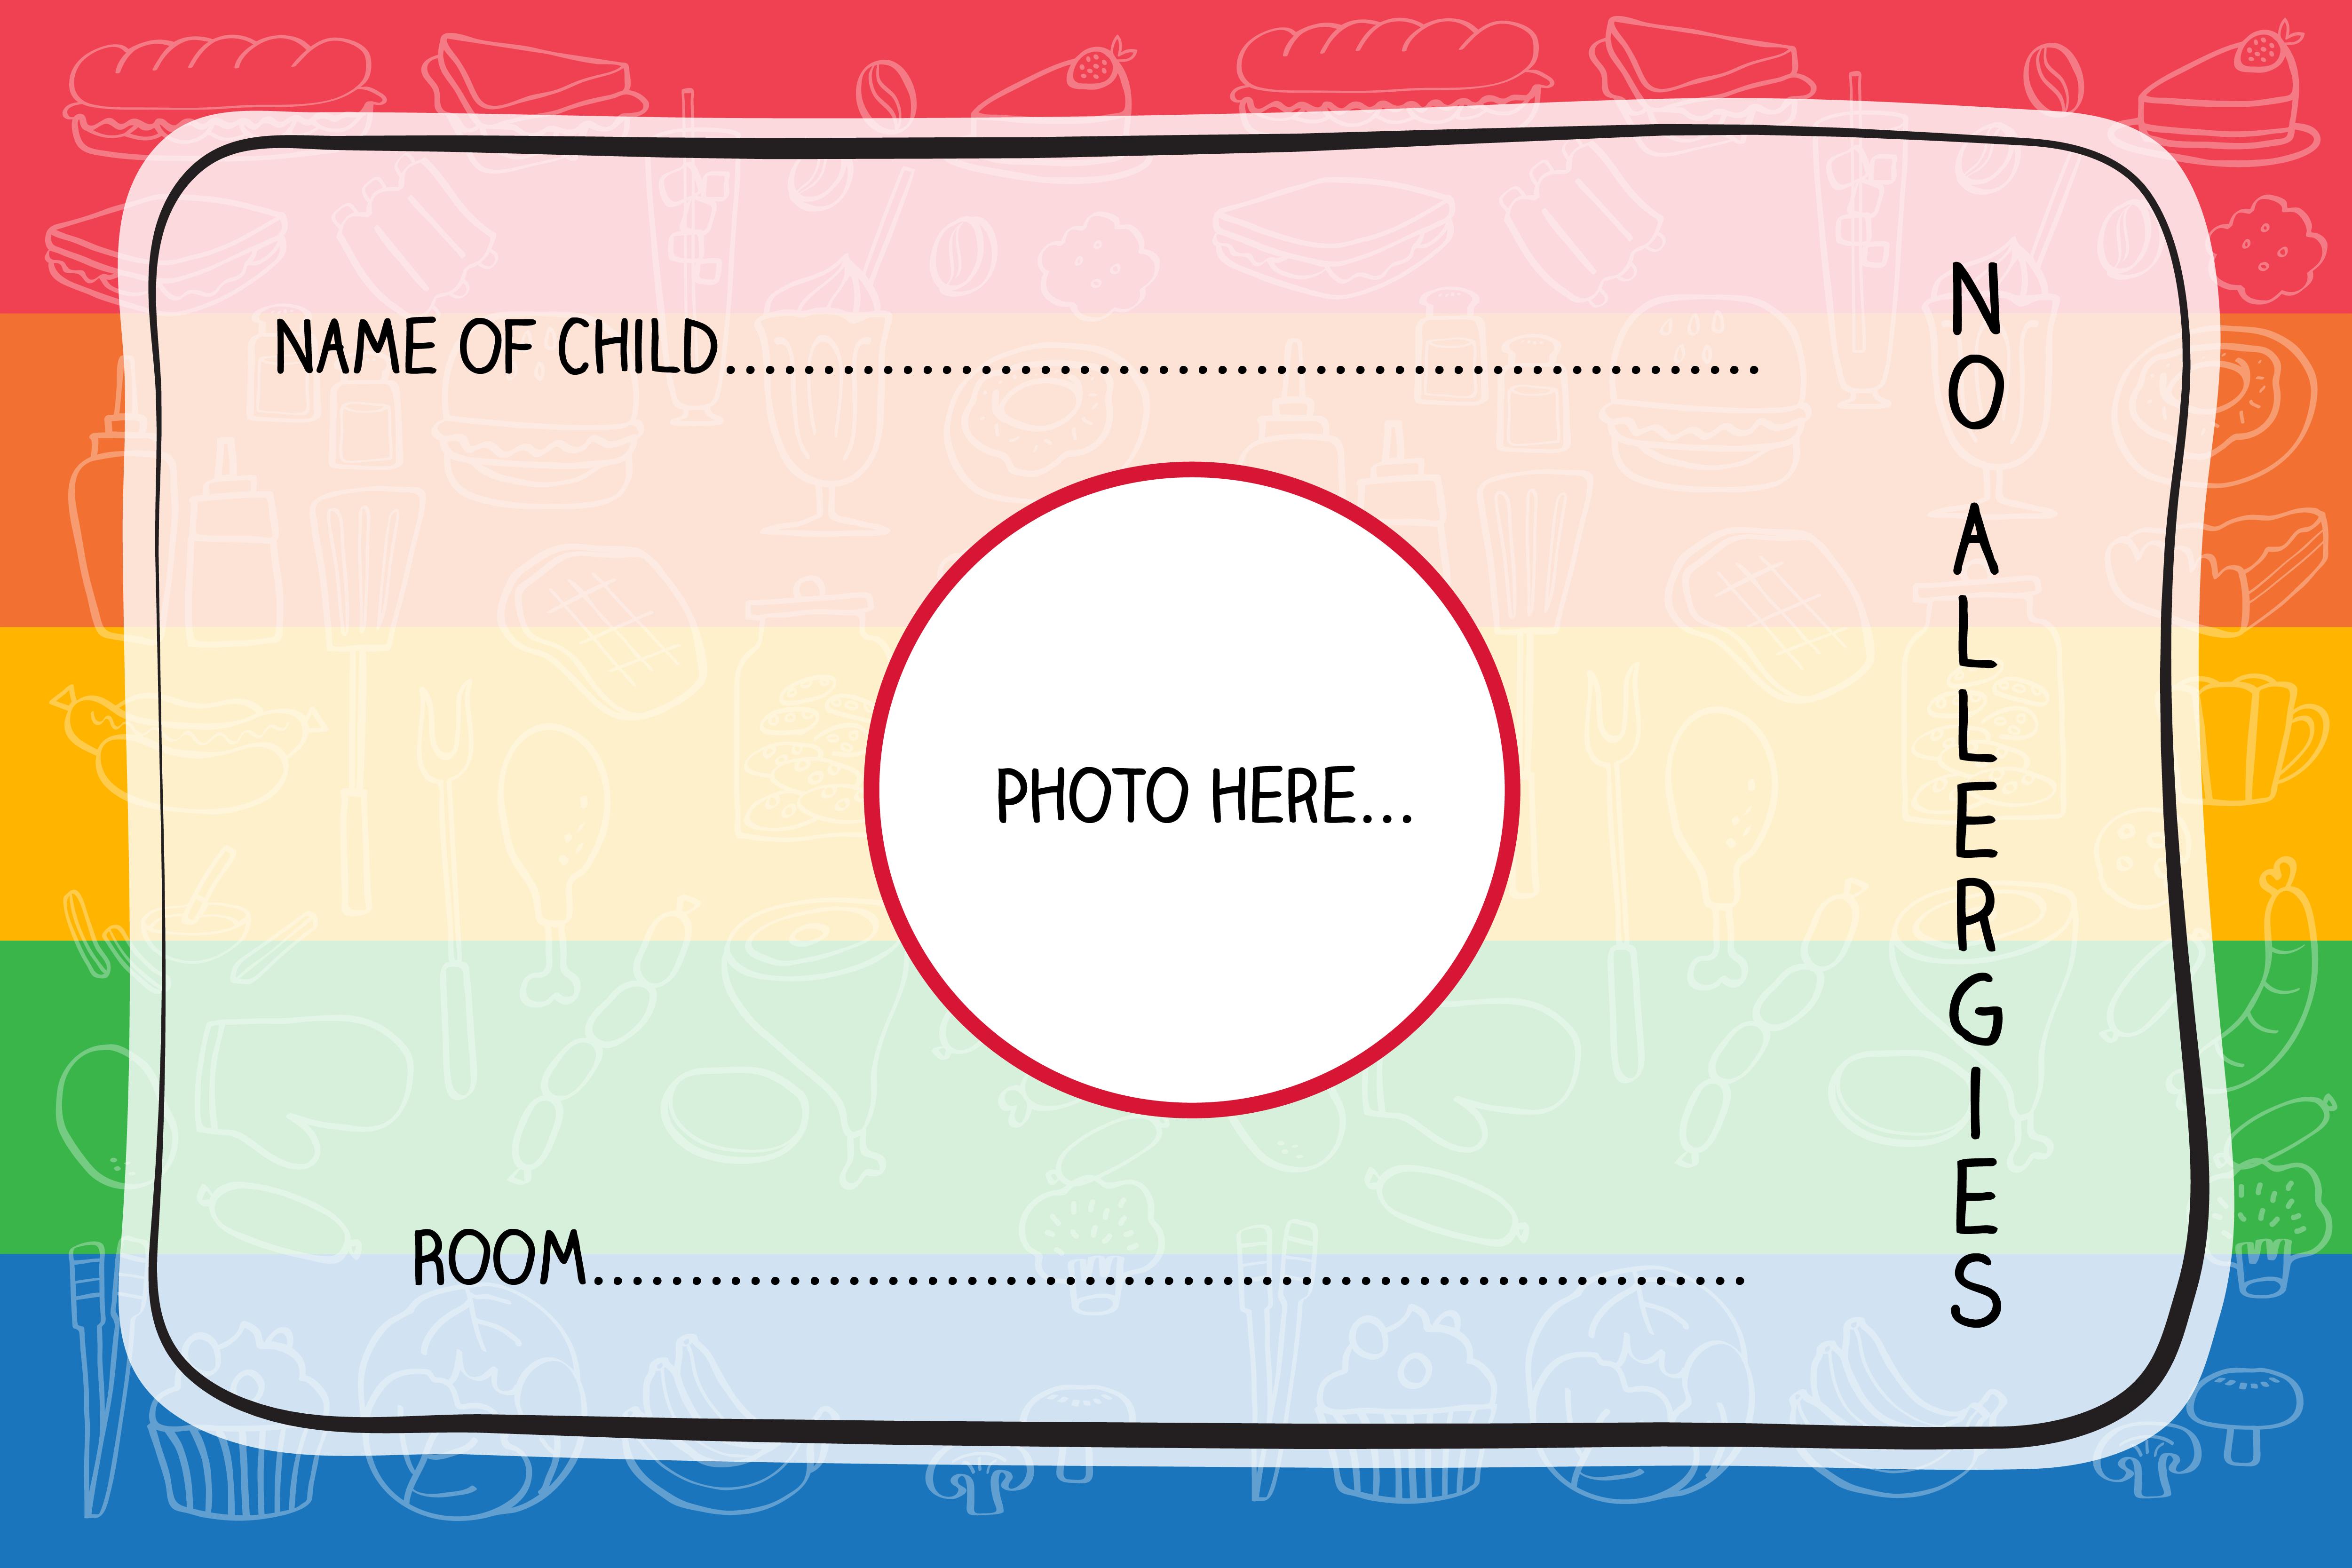 Childminder Resources   Happy & Healthy Children   Parenta - Free Printable Childminding Resources